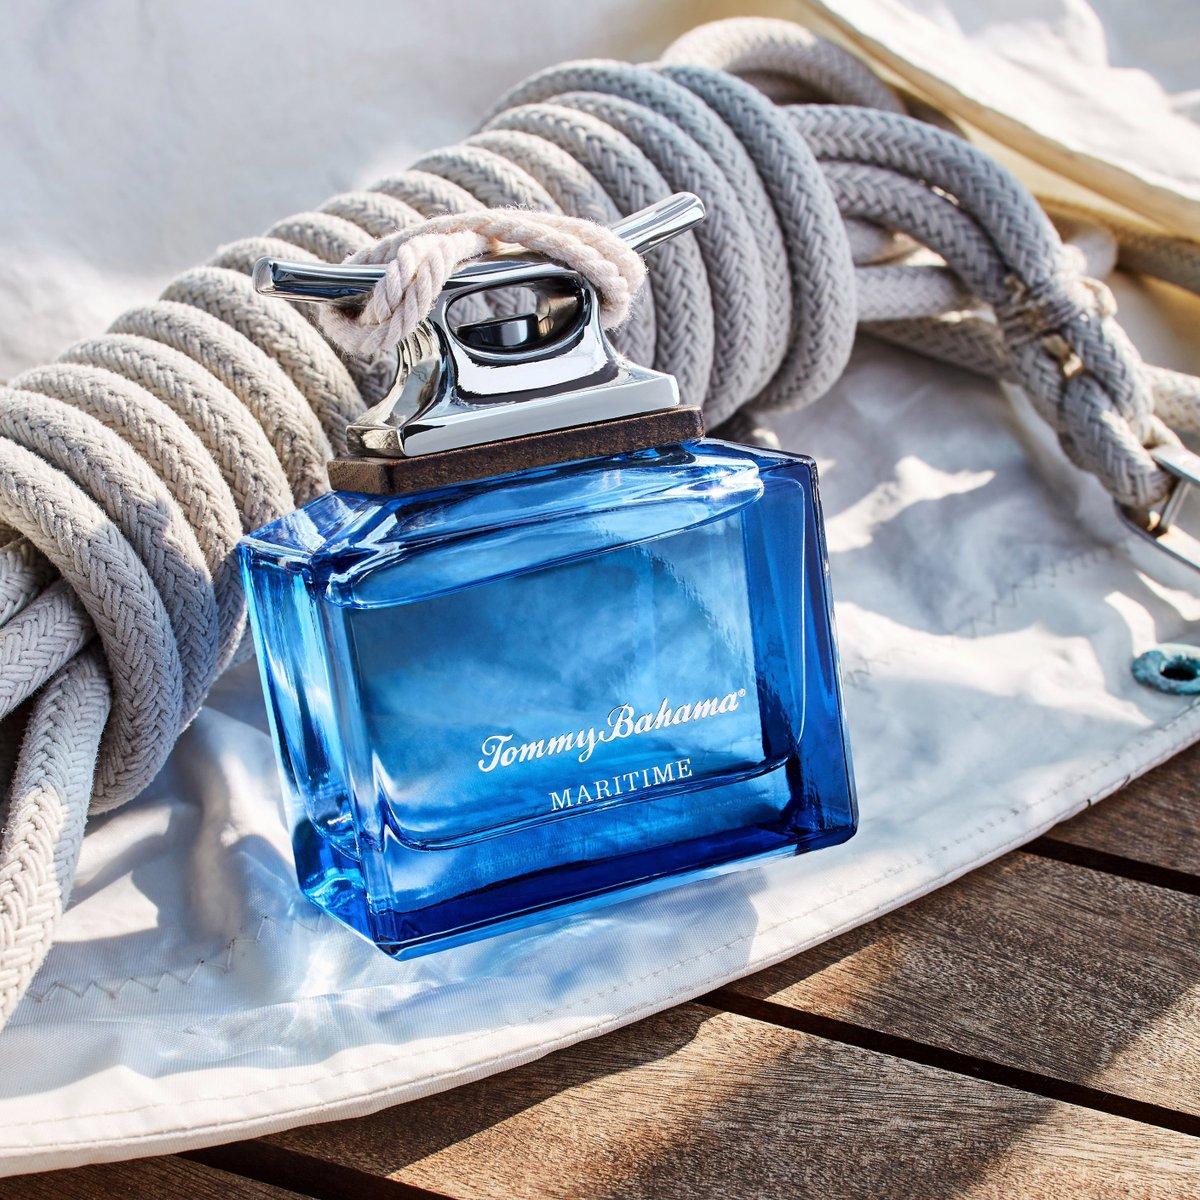 tommy bahama maritime blue